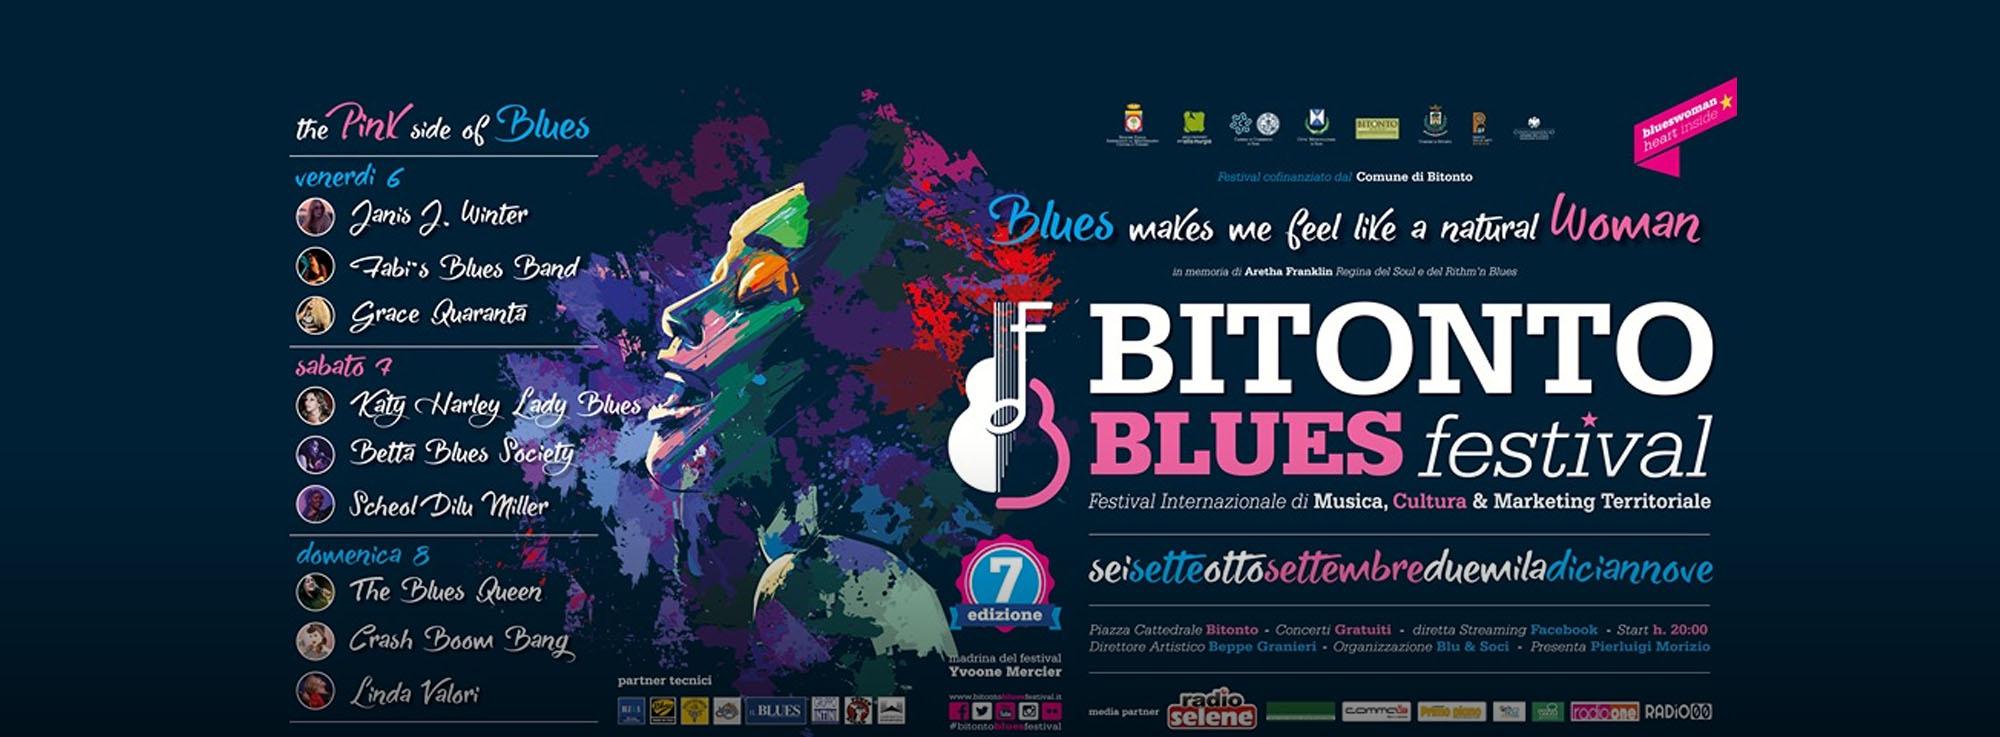 Bitonto: Bitonto Blues Festival